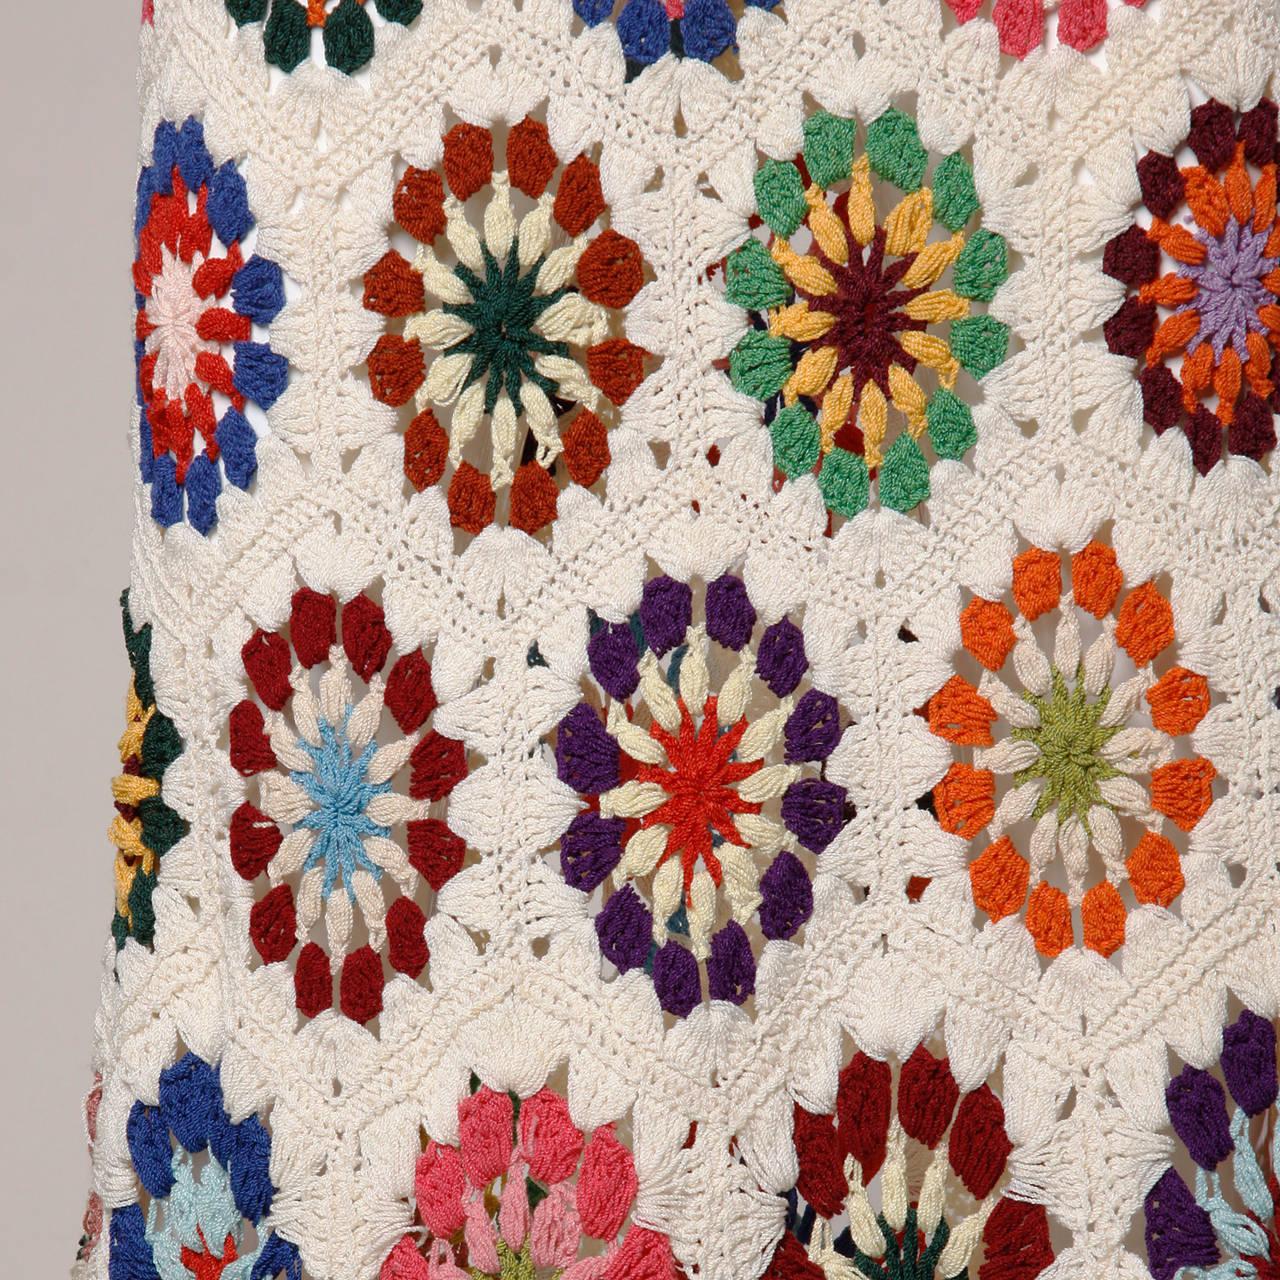 1970s Vintage Colorful Hand-Crochet Boho Maxi Skirt 3